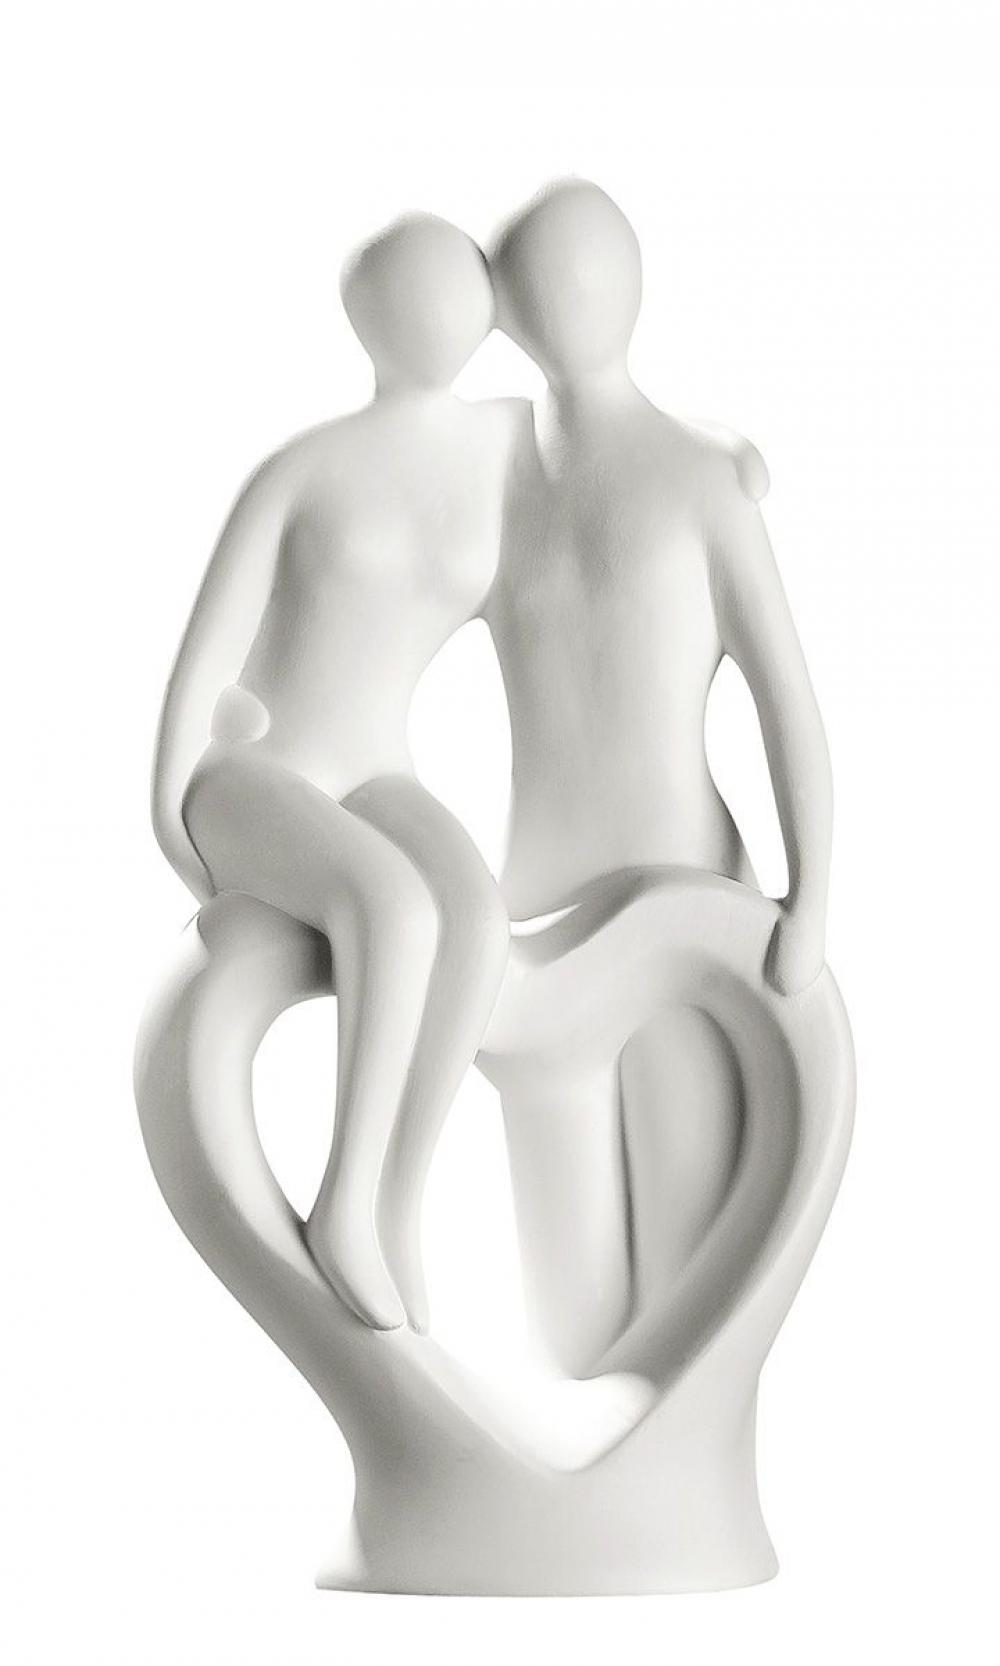 Statueta decorativa din ceramica Heartly Backing H39cm imagine 2021 insignis.ro